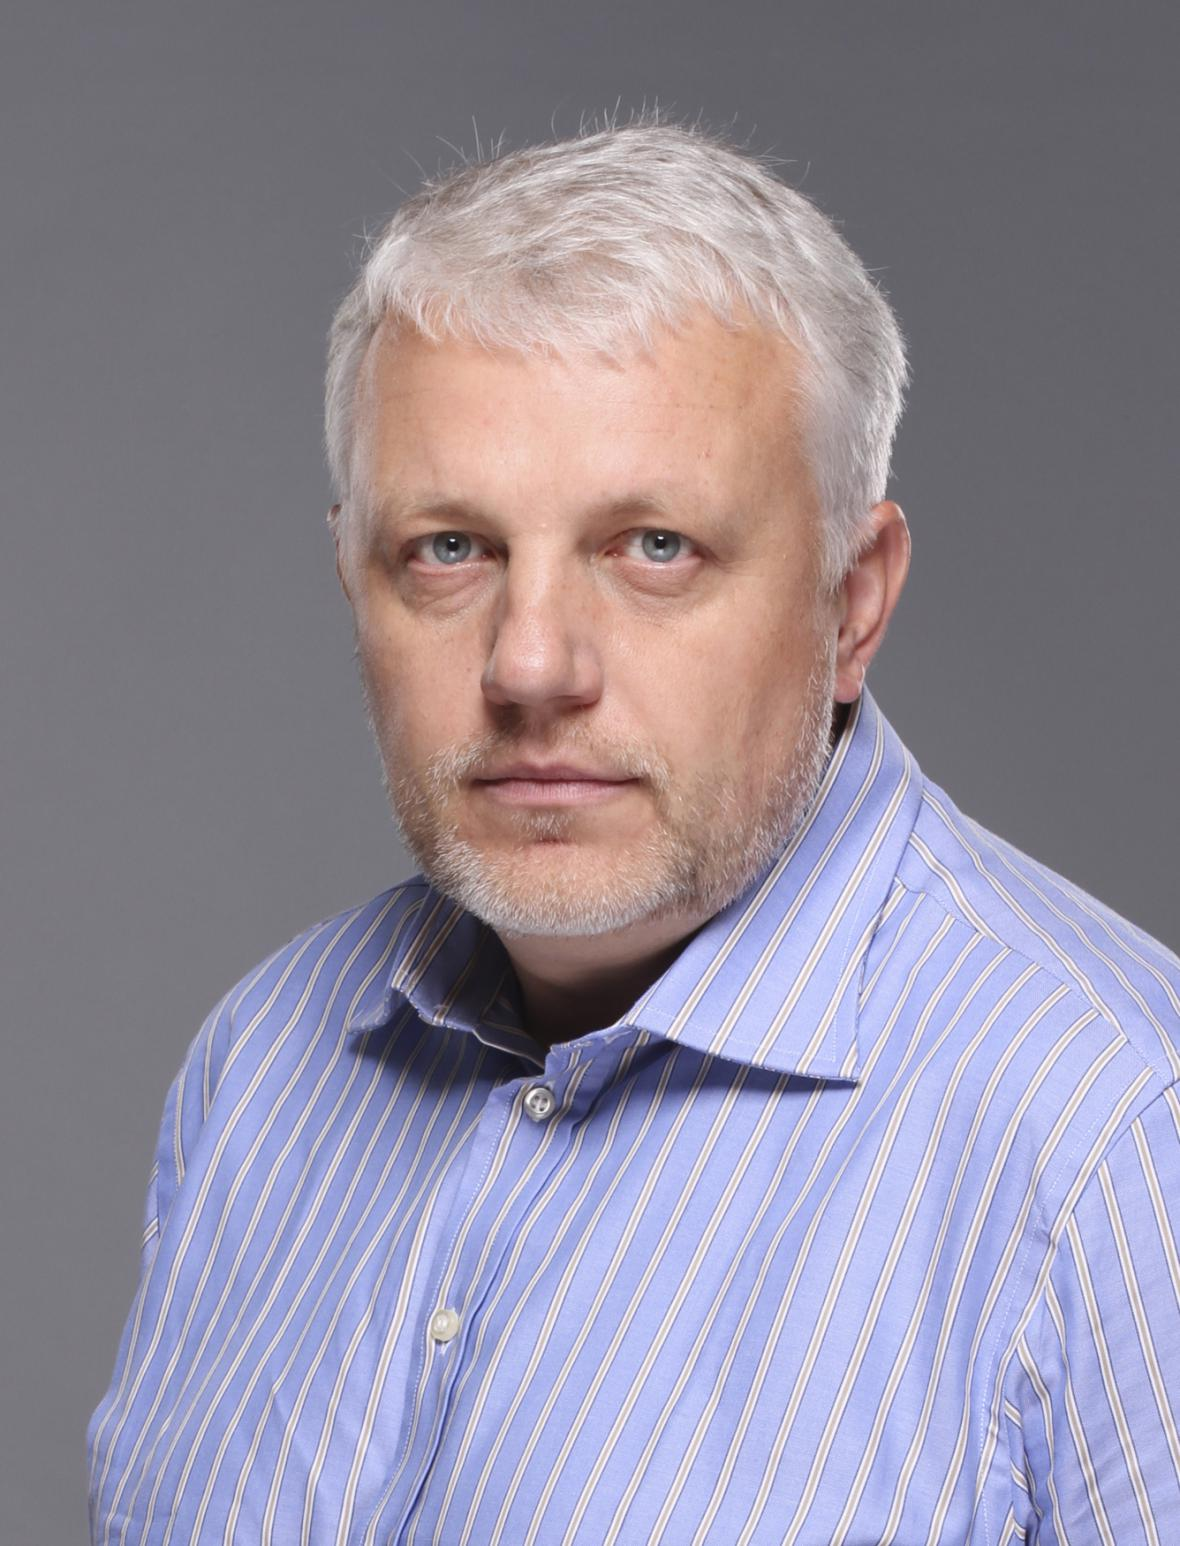 Pavlo Šeremet